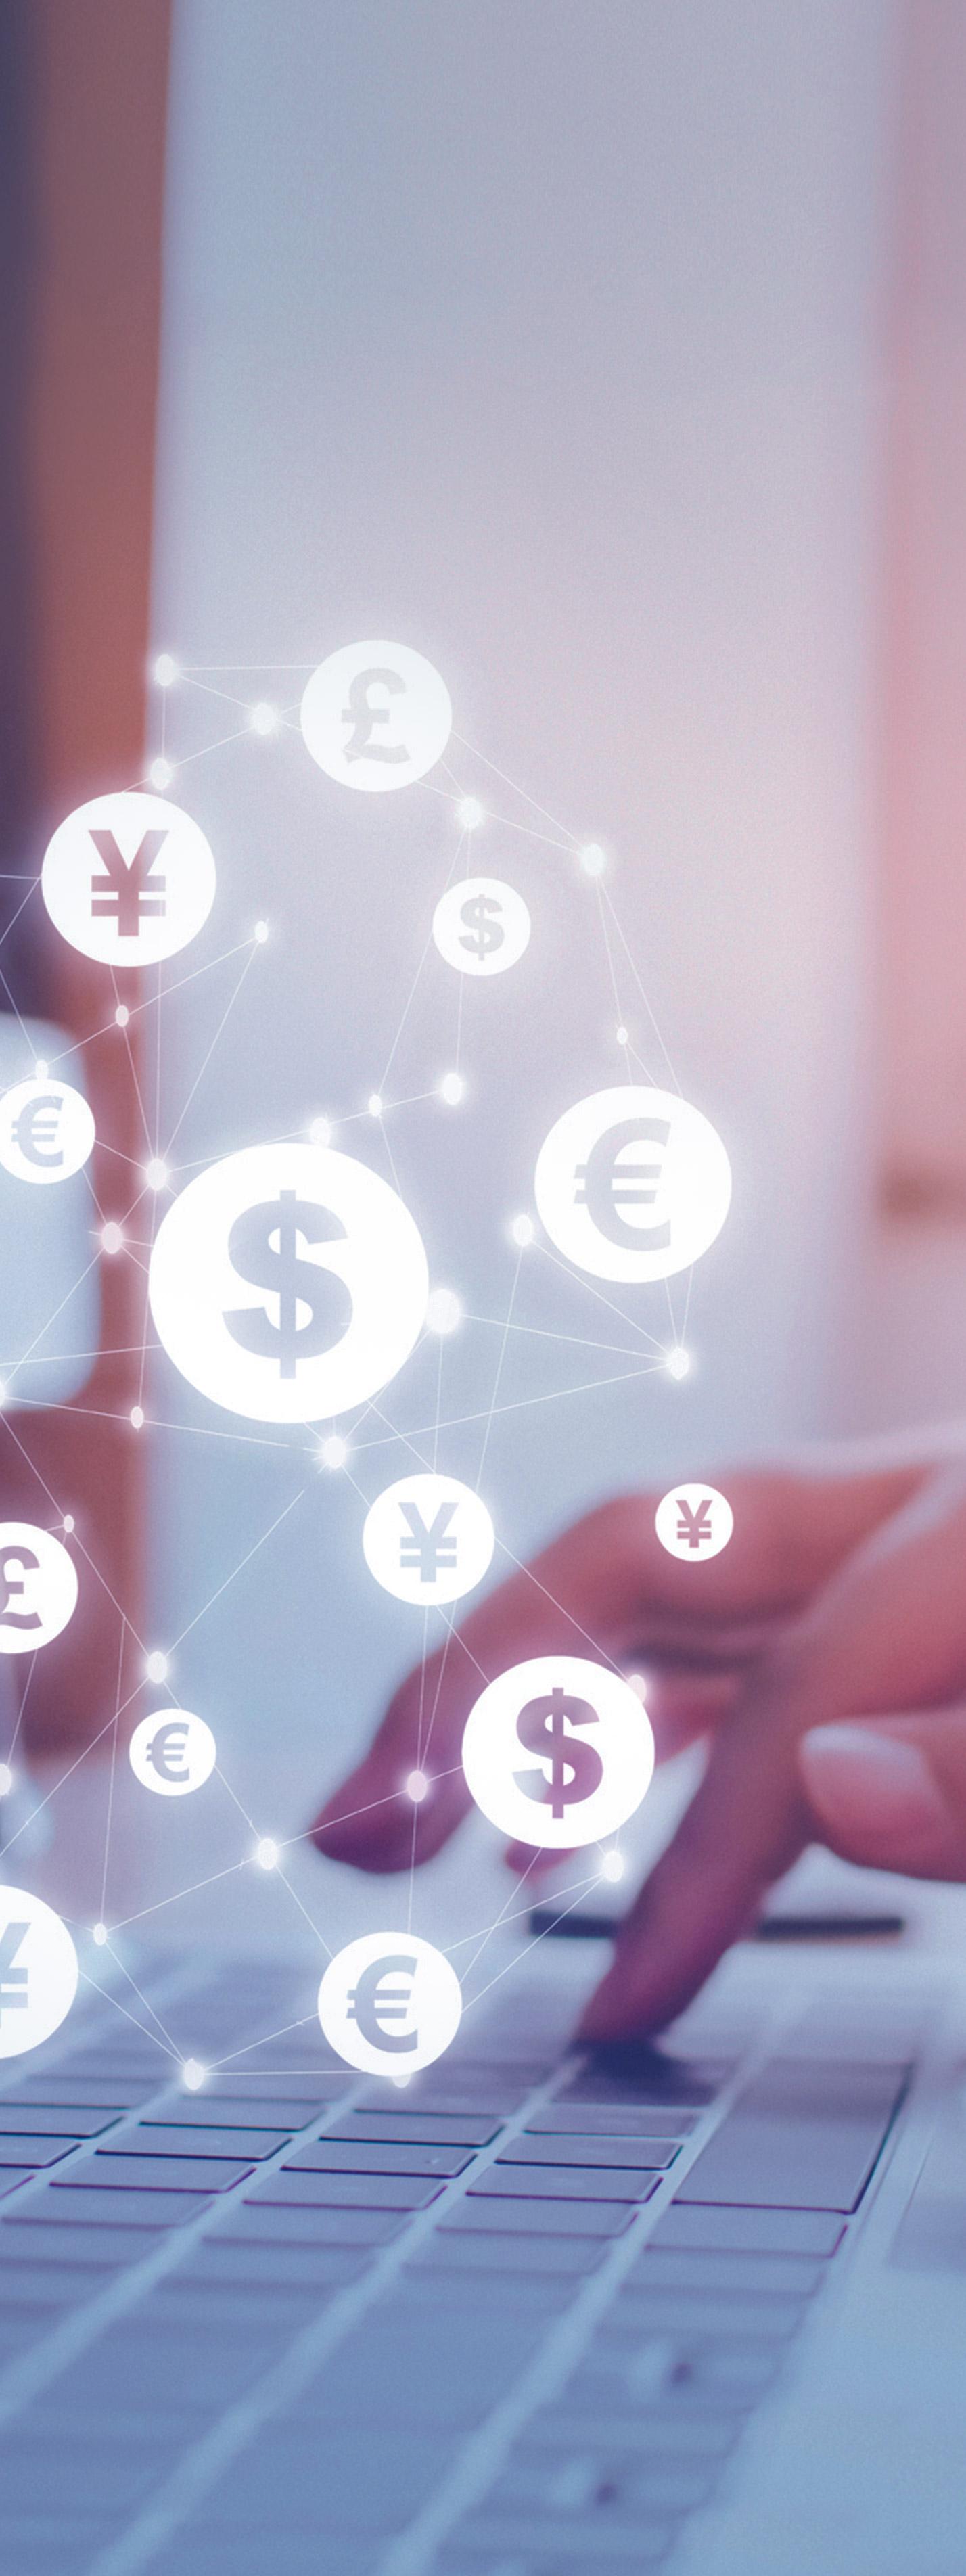 Alternative financing report